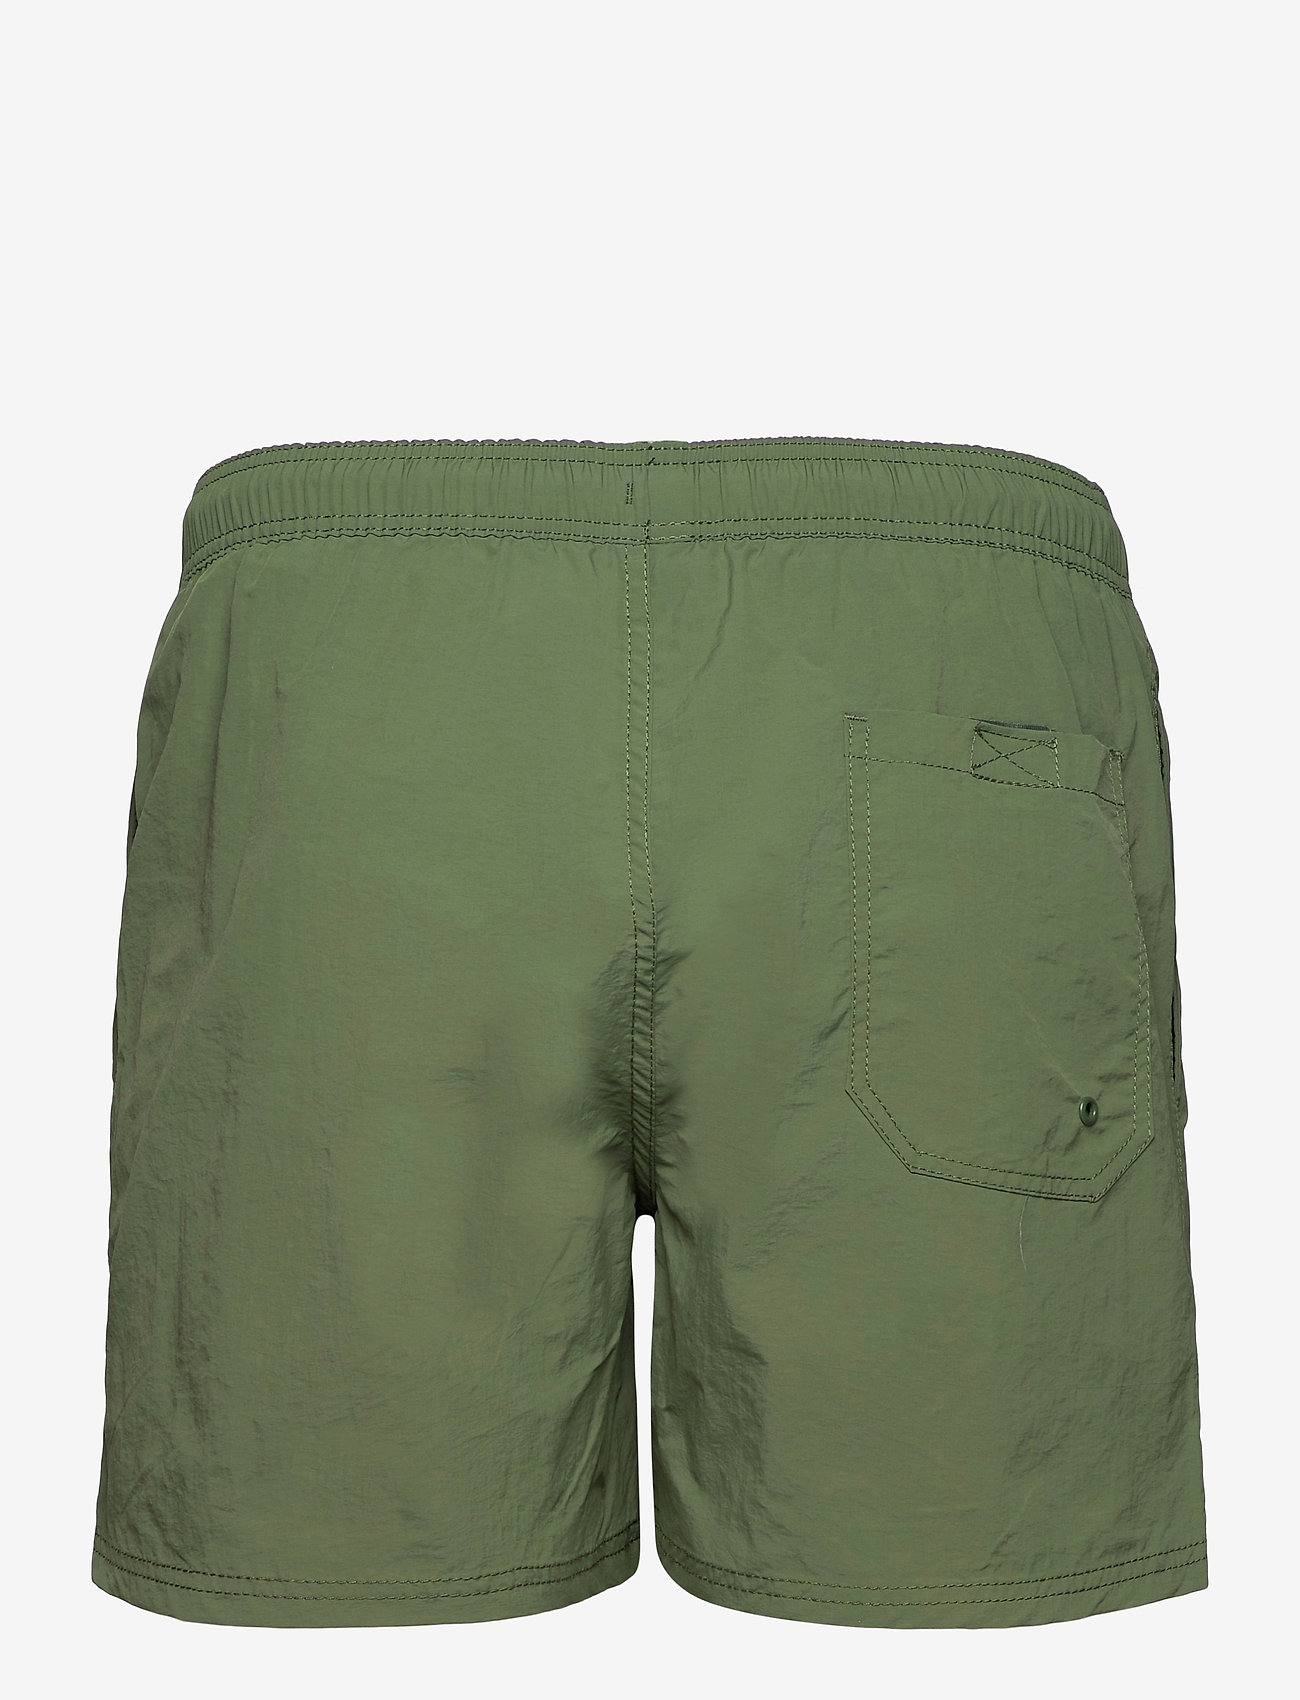 H2O - Leisure Swim Shorts - uimashortsit - army - 1